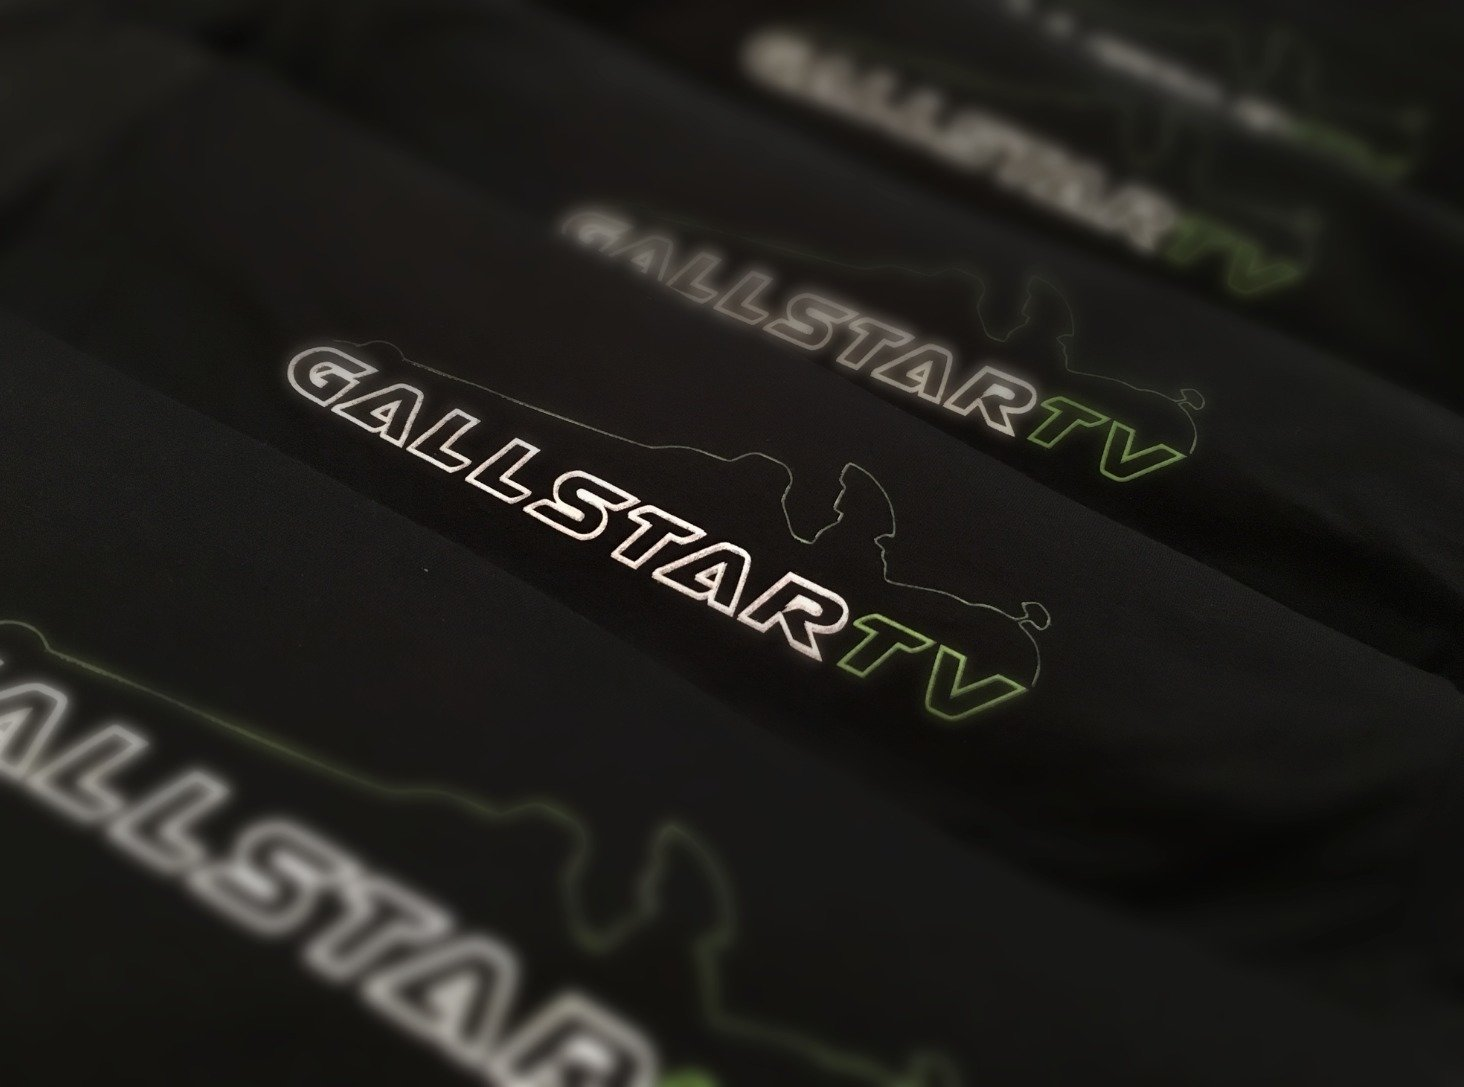 Black/Green GallStar Dragster Silhouette